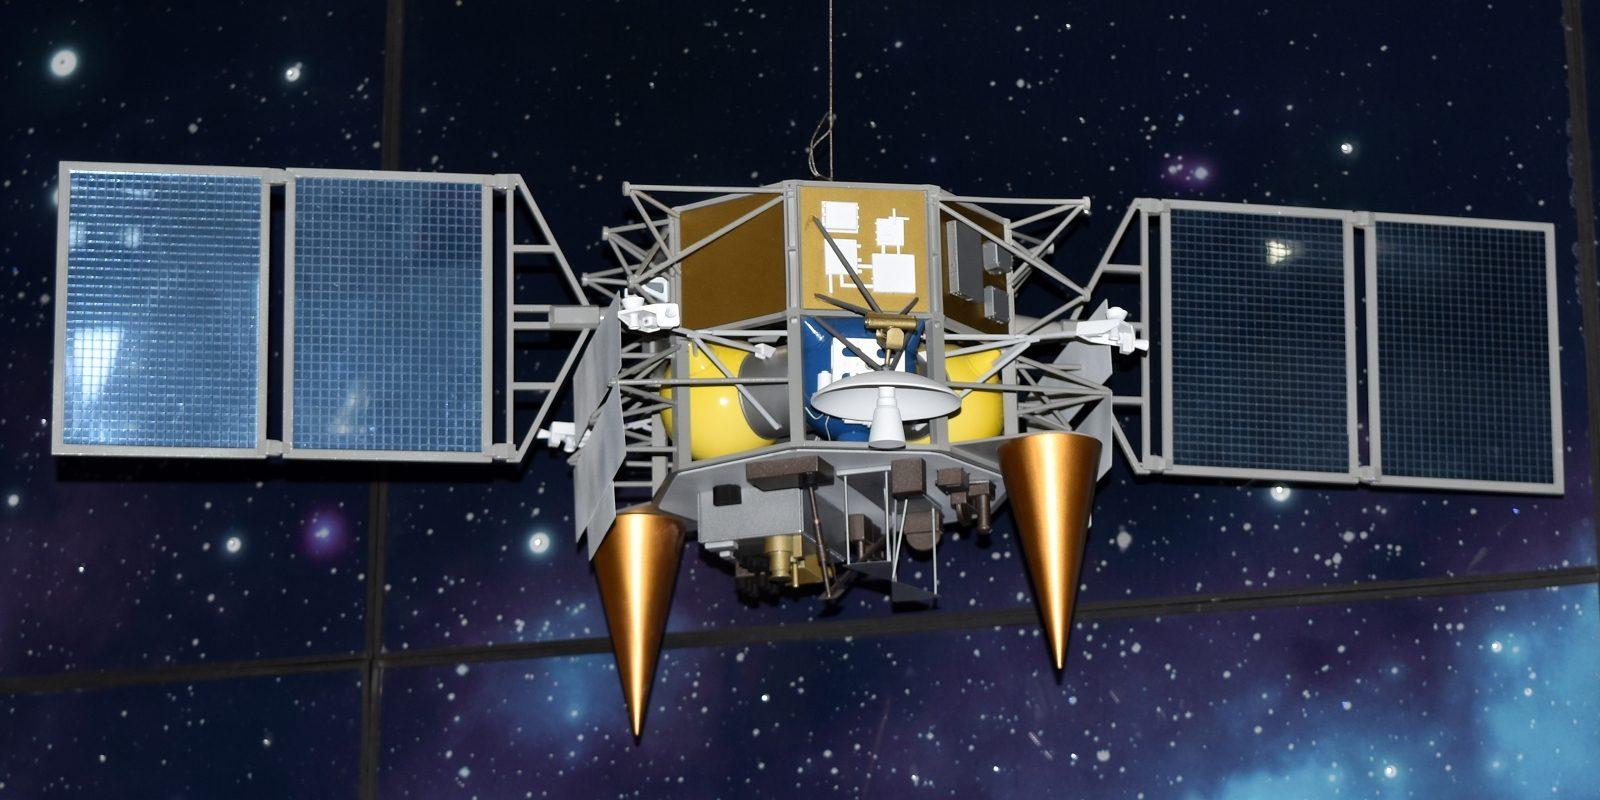 Luna-26 lunar orbiter